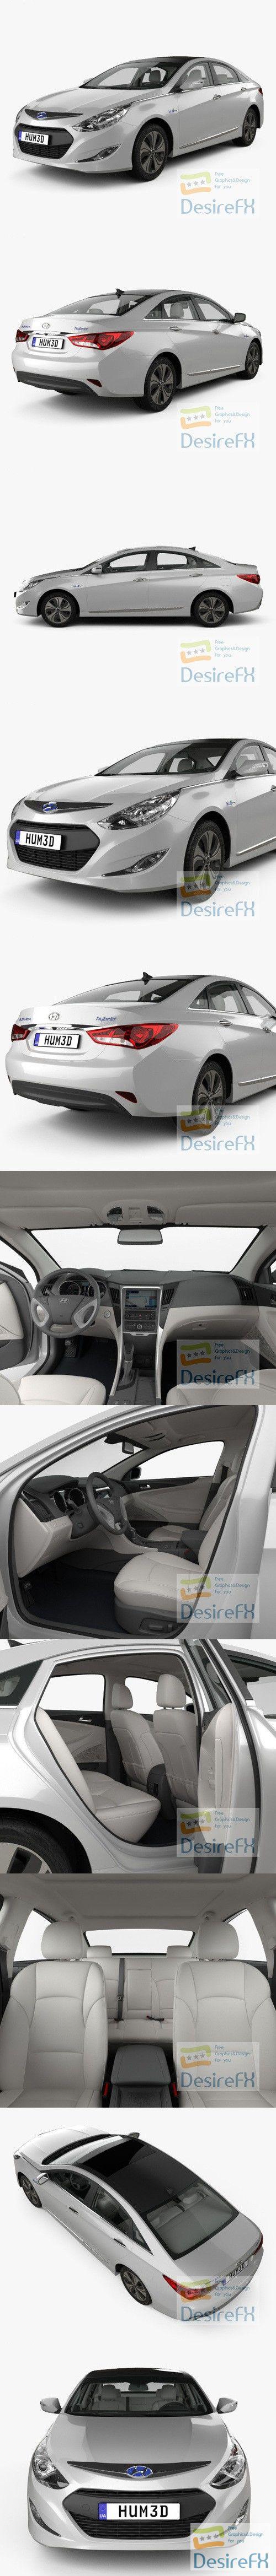 Hyundai Sonata hybrid with HQ interior 2015 3D Model